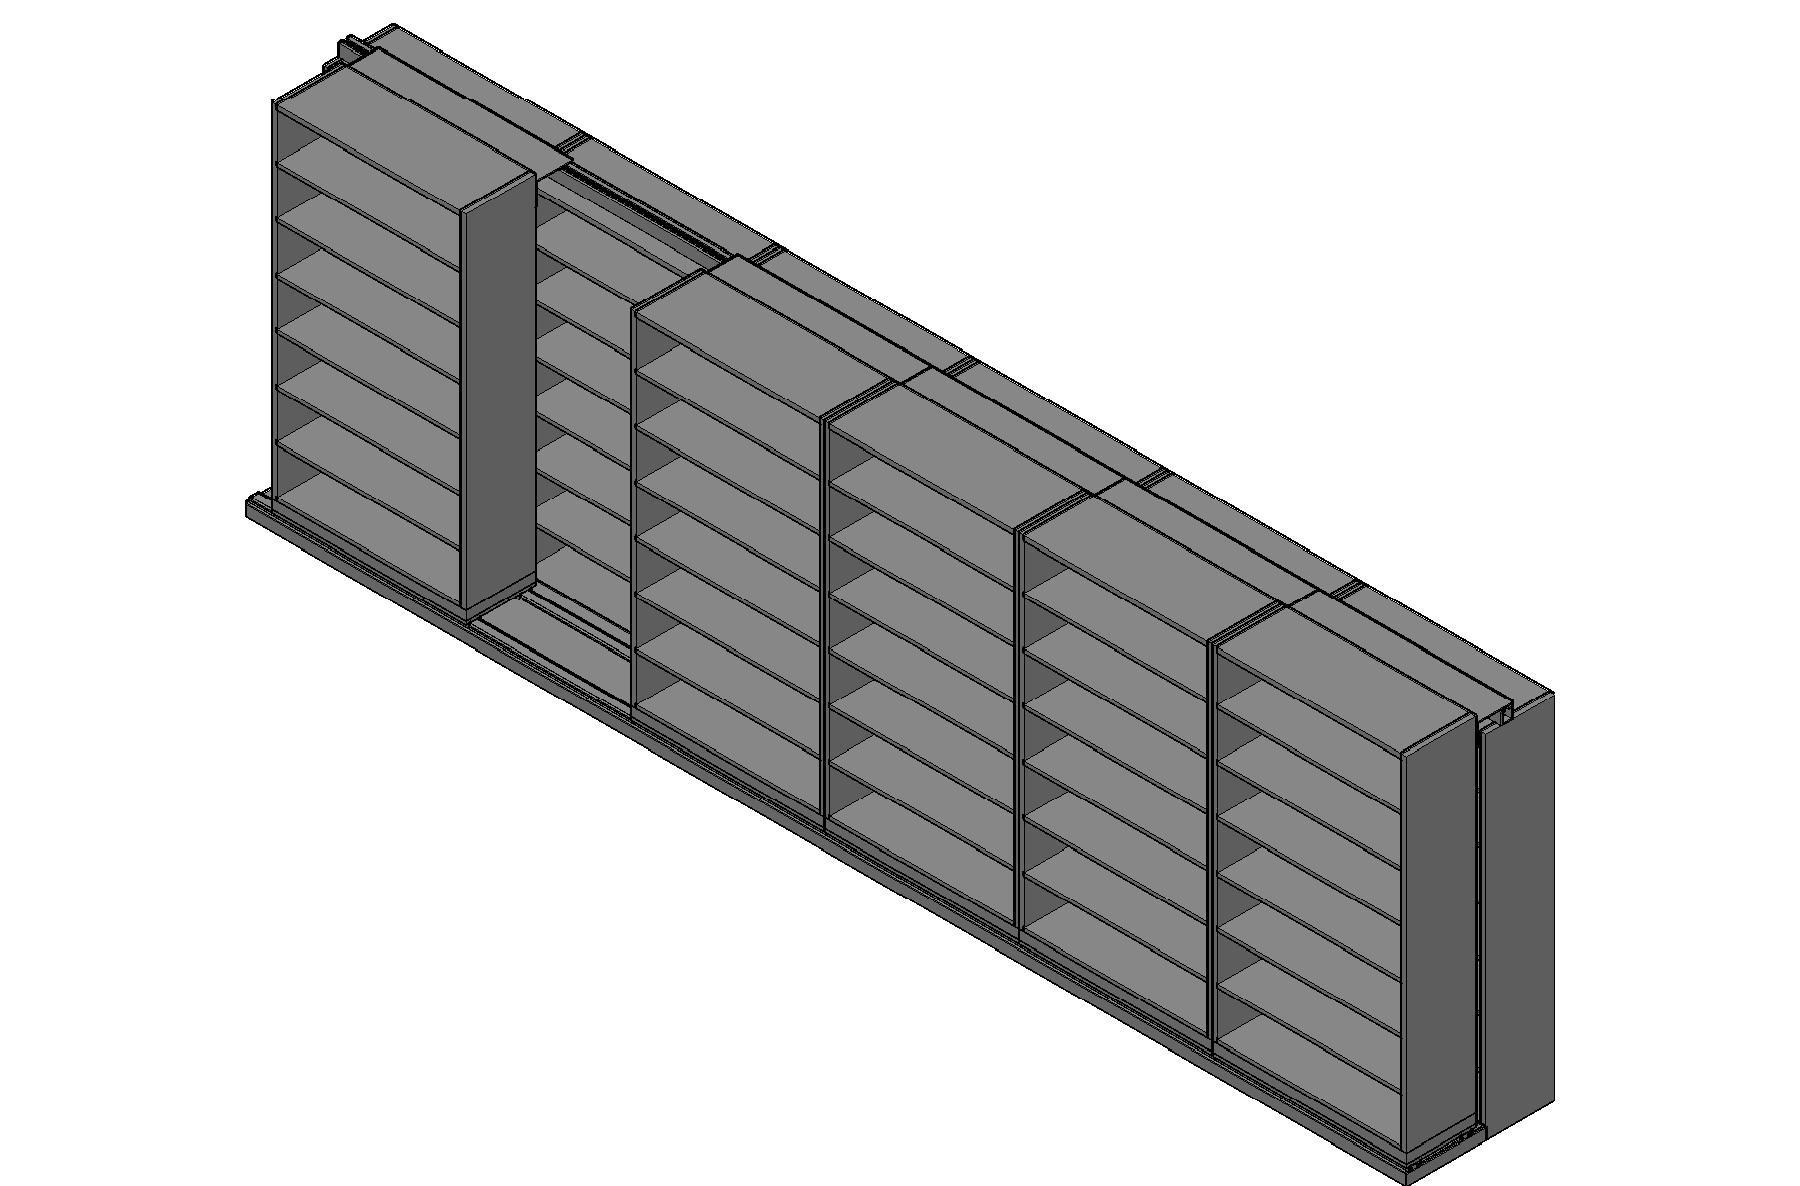 "Legal Size Sliding Shelves - 2 Rows Deep - 7 Levels - (42"" x 15"" Shelves) - 256"" Total Width"